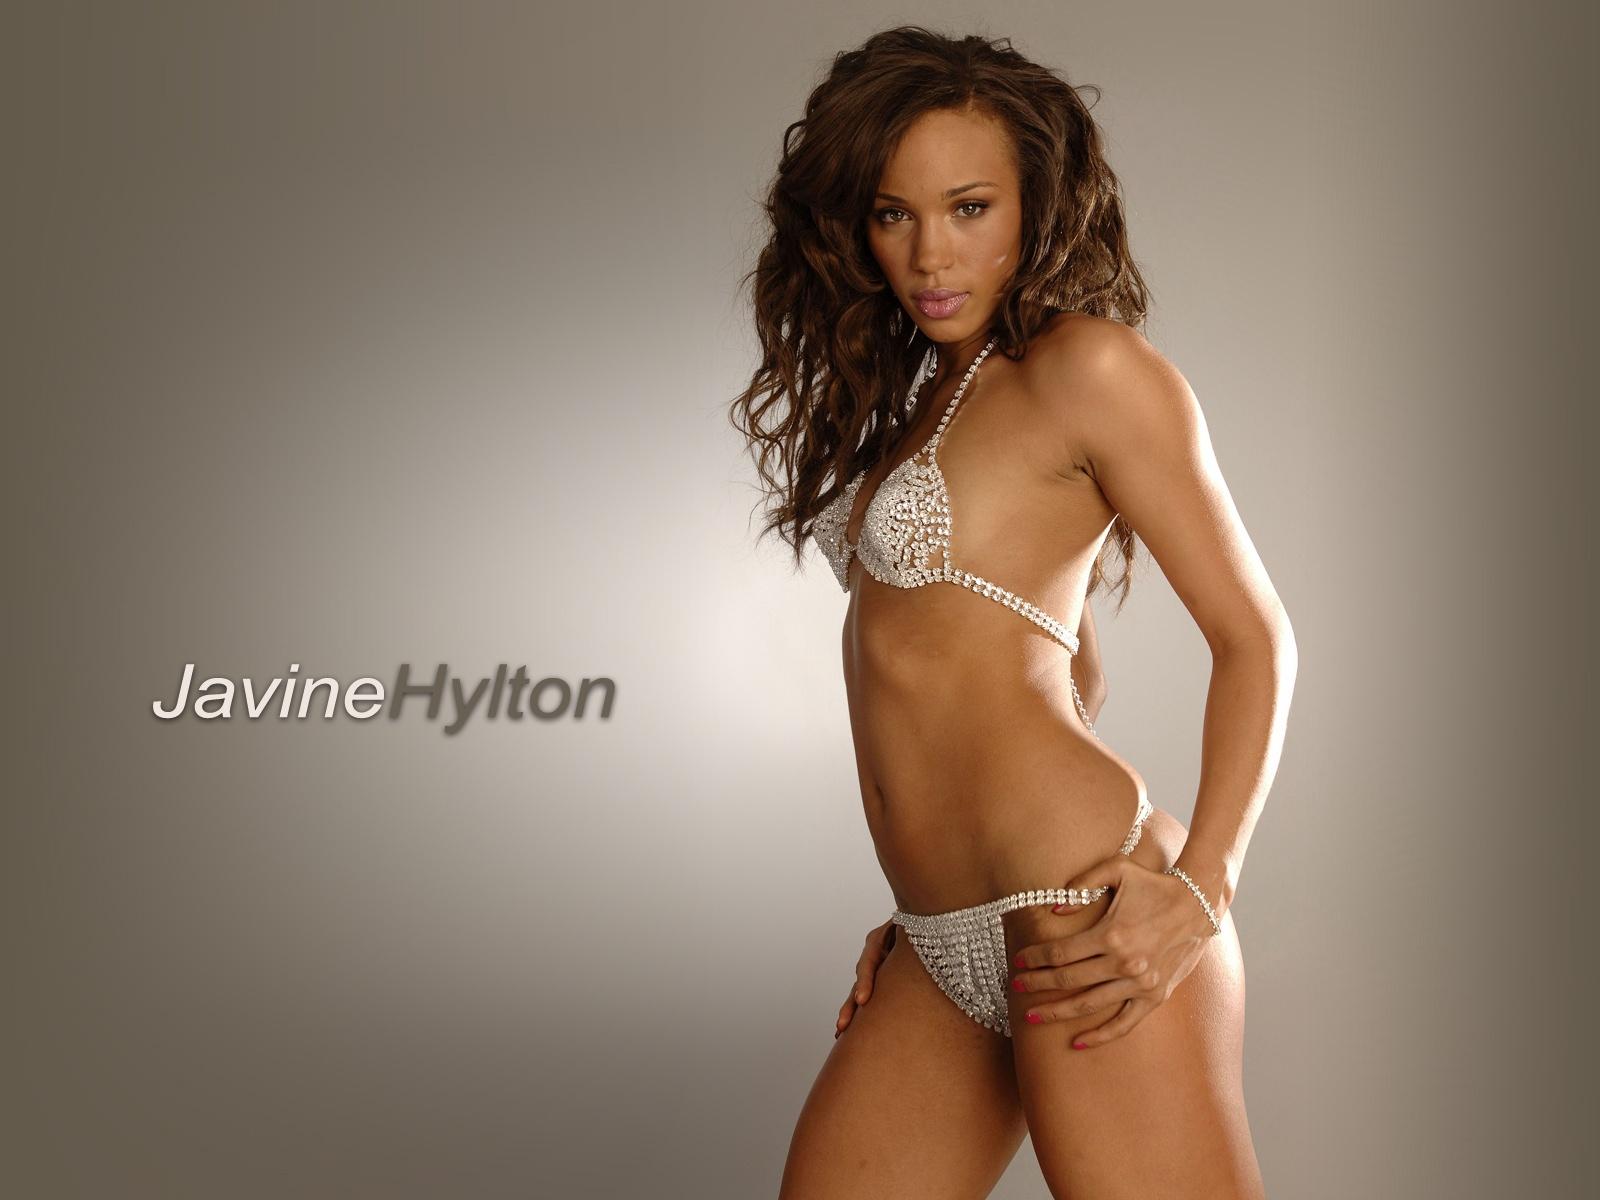 Leaked Javine Hylton naked (63 photos), Topless, Hot, Boobs, underwear 2020